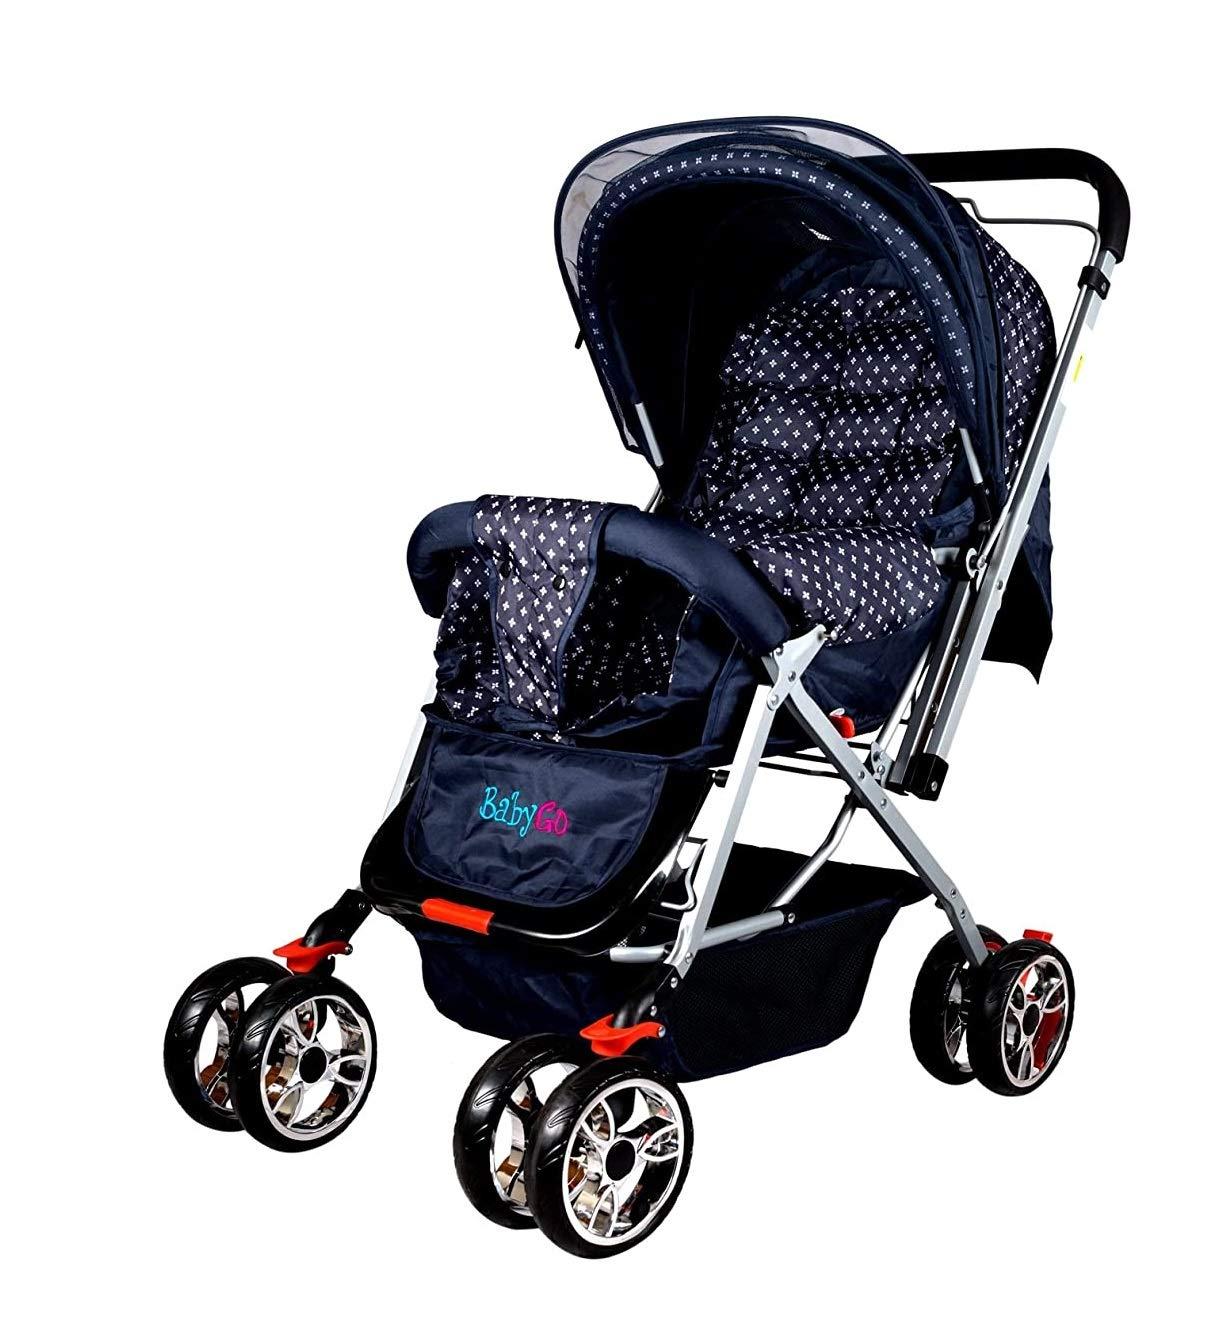 BabyGo Delight Reversible Baby Stroller & Pram with Mosquito Net, Mama Diaper Bag & Wheel Breaks (Navy Blue)